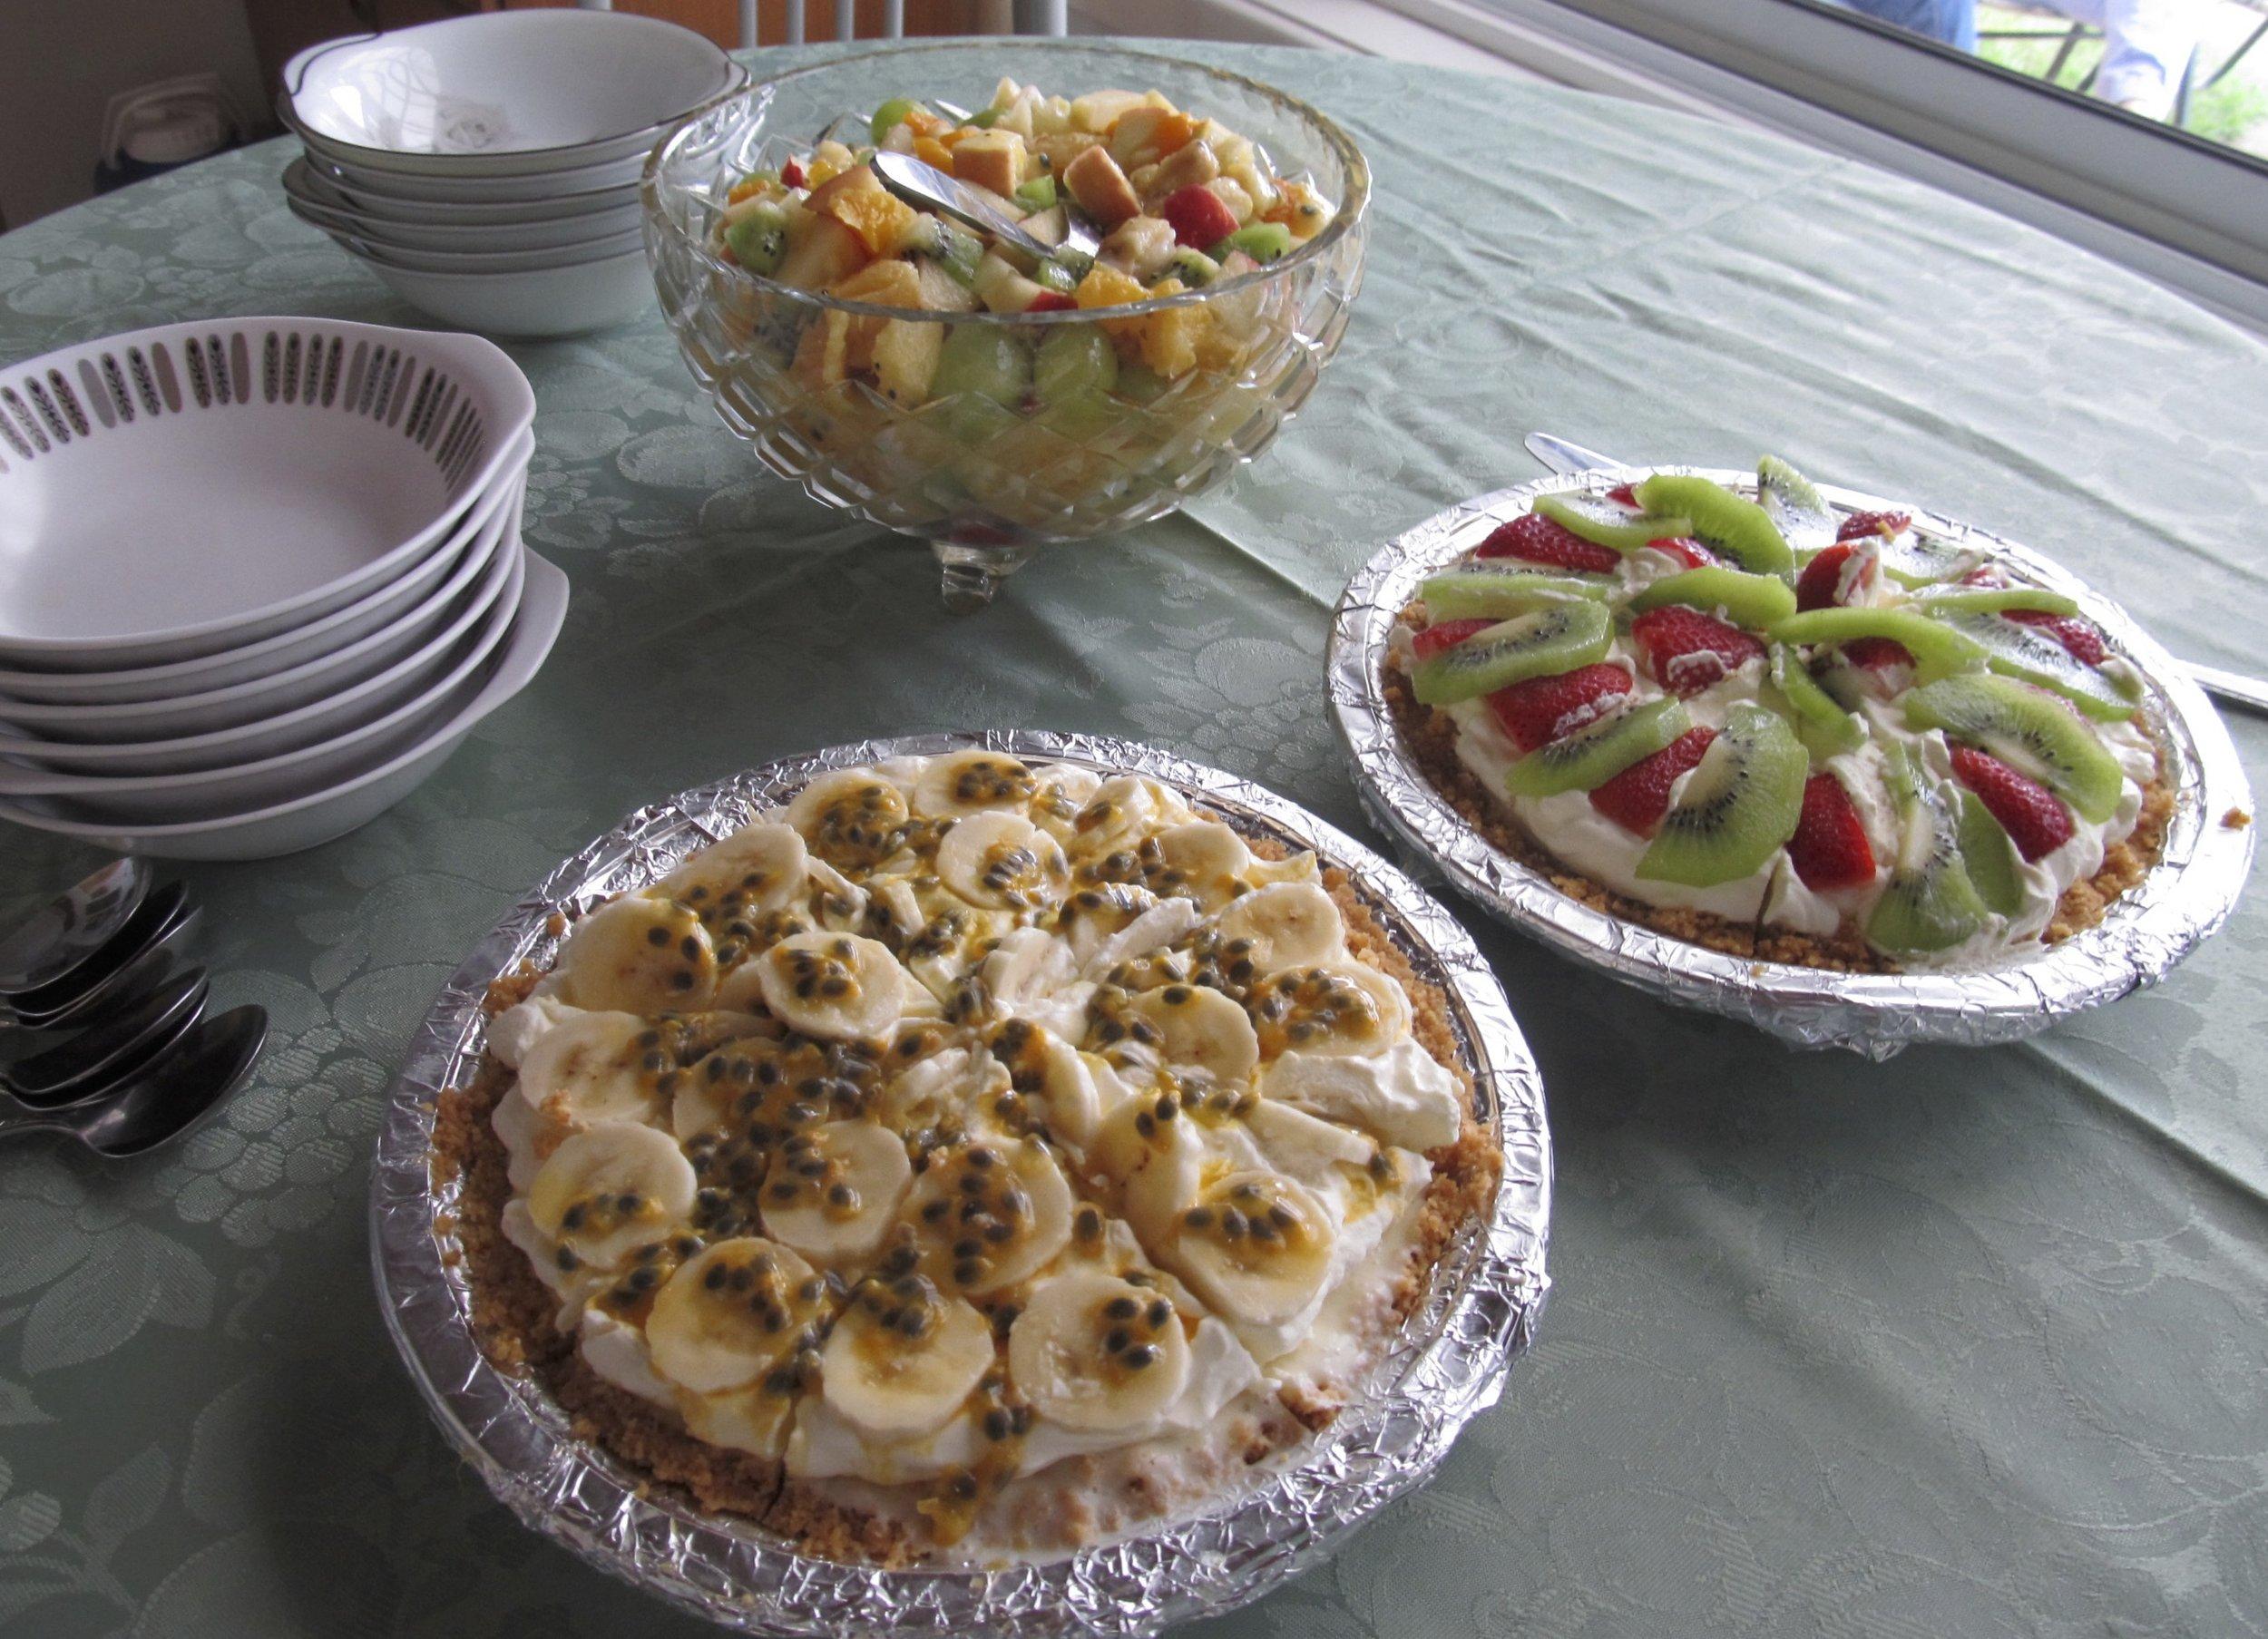 Kathy's Cheese cakes PLUS Grandmas fruit salad!